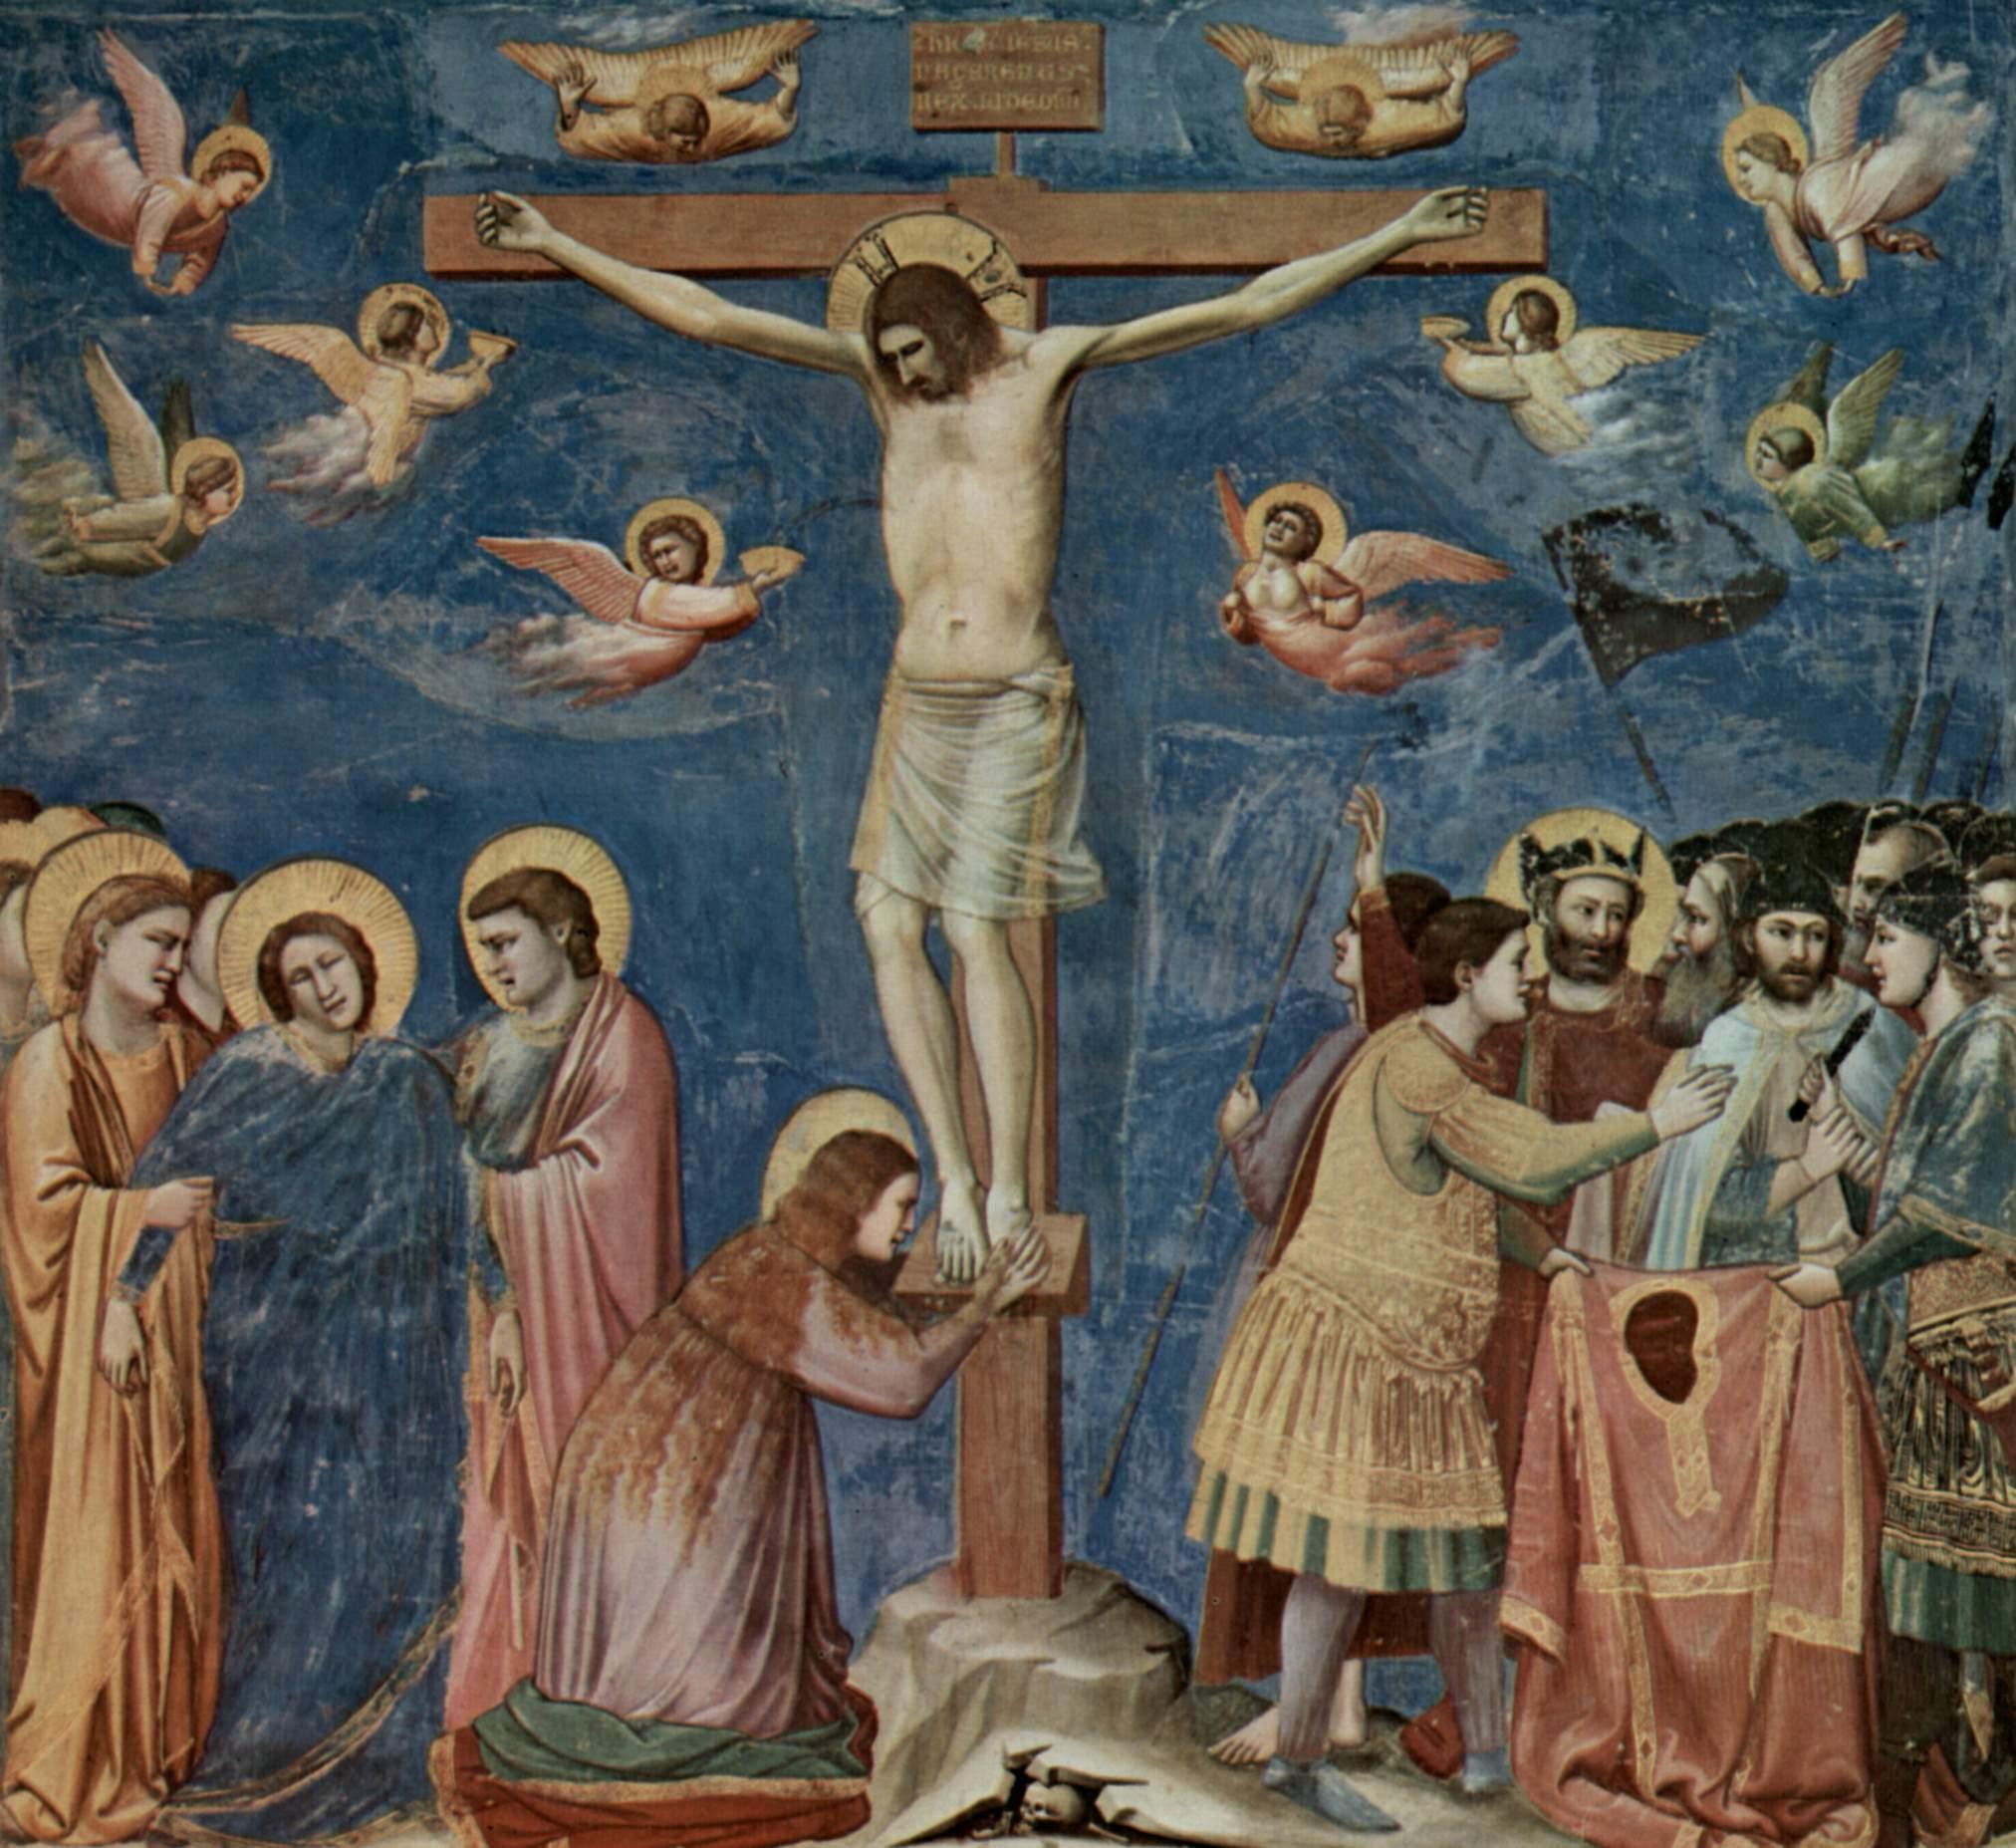 Giotto di Bondone: Crucificação na  Cappella degli Scrovegni, em Pádua (1304-1306)